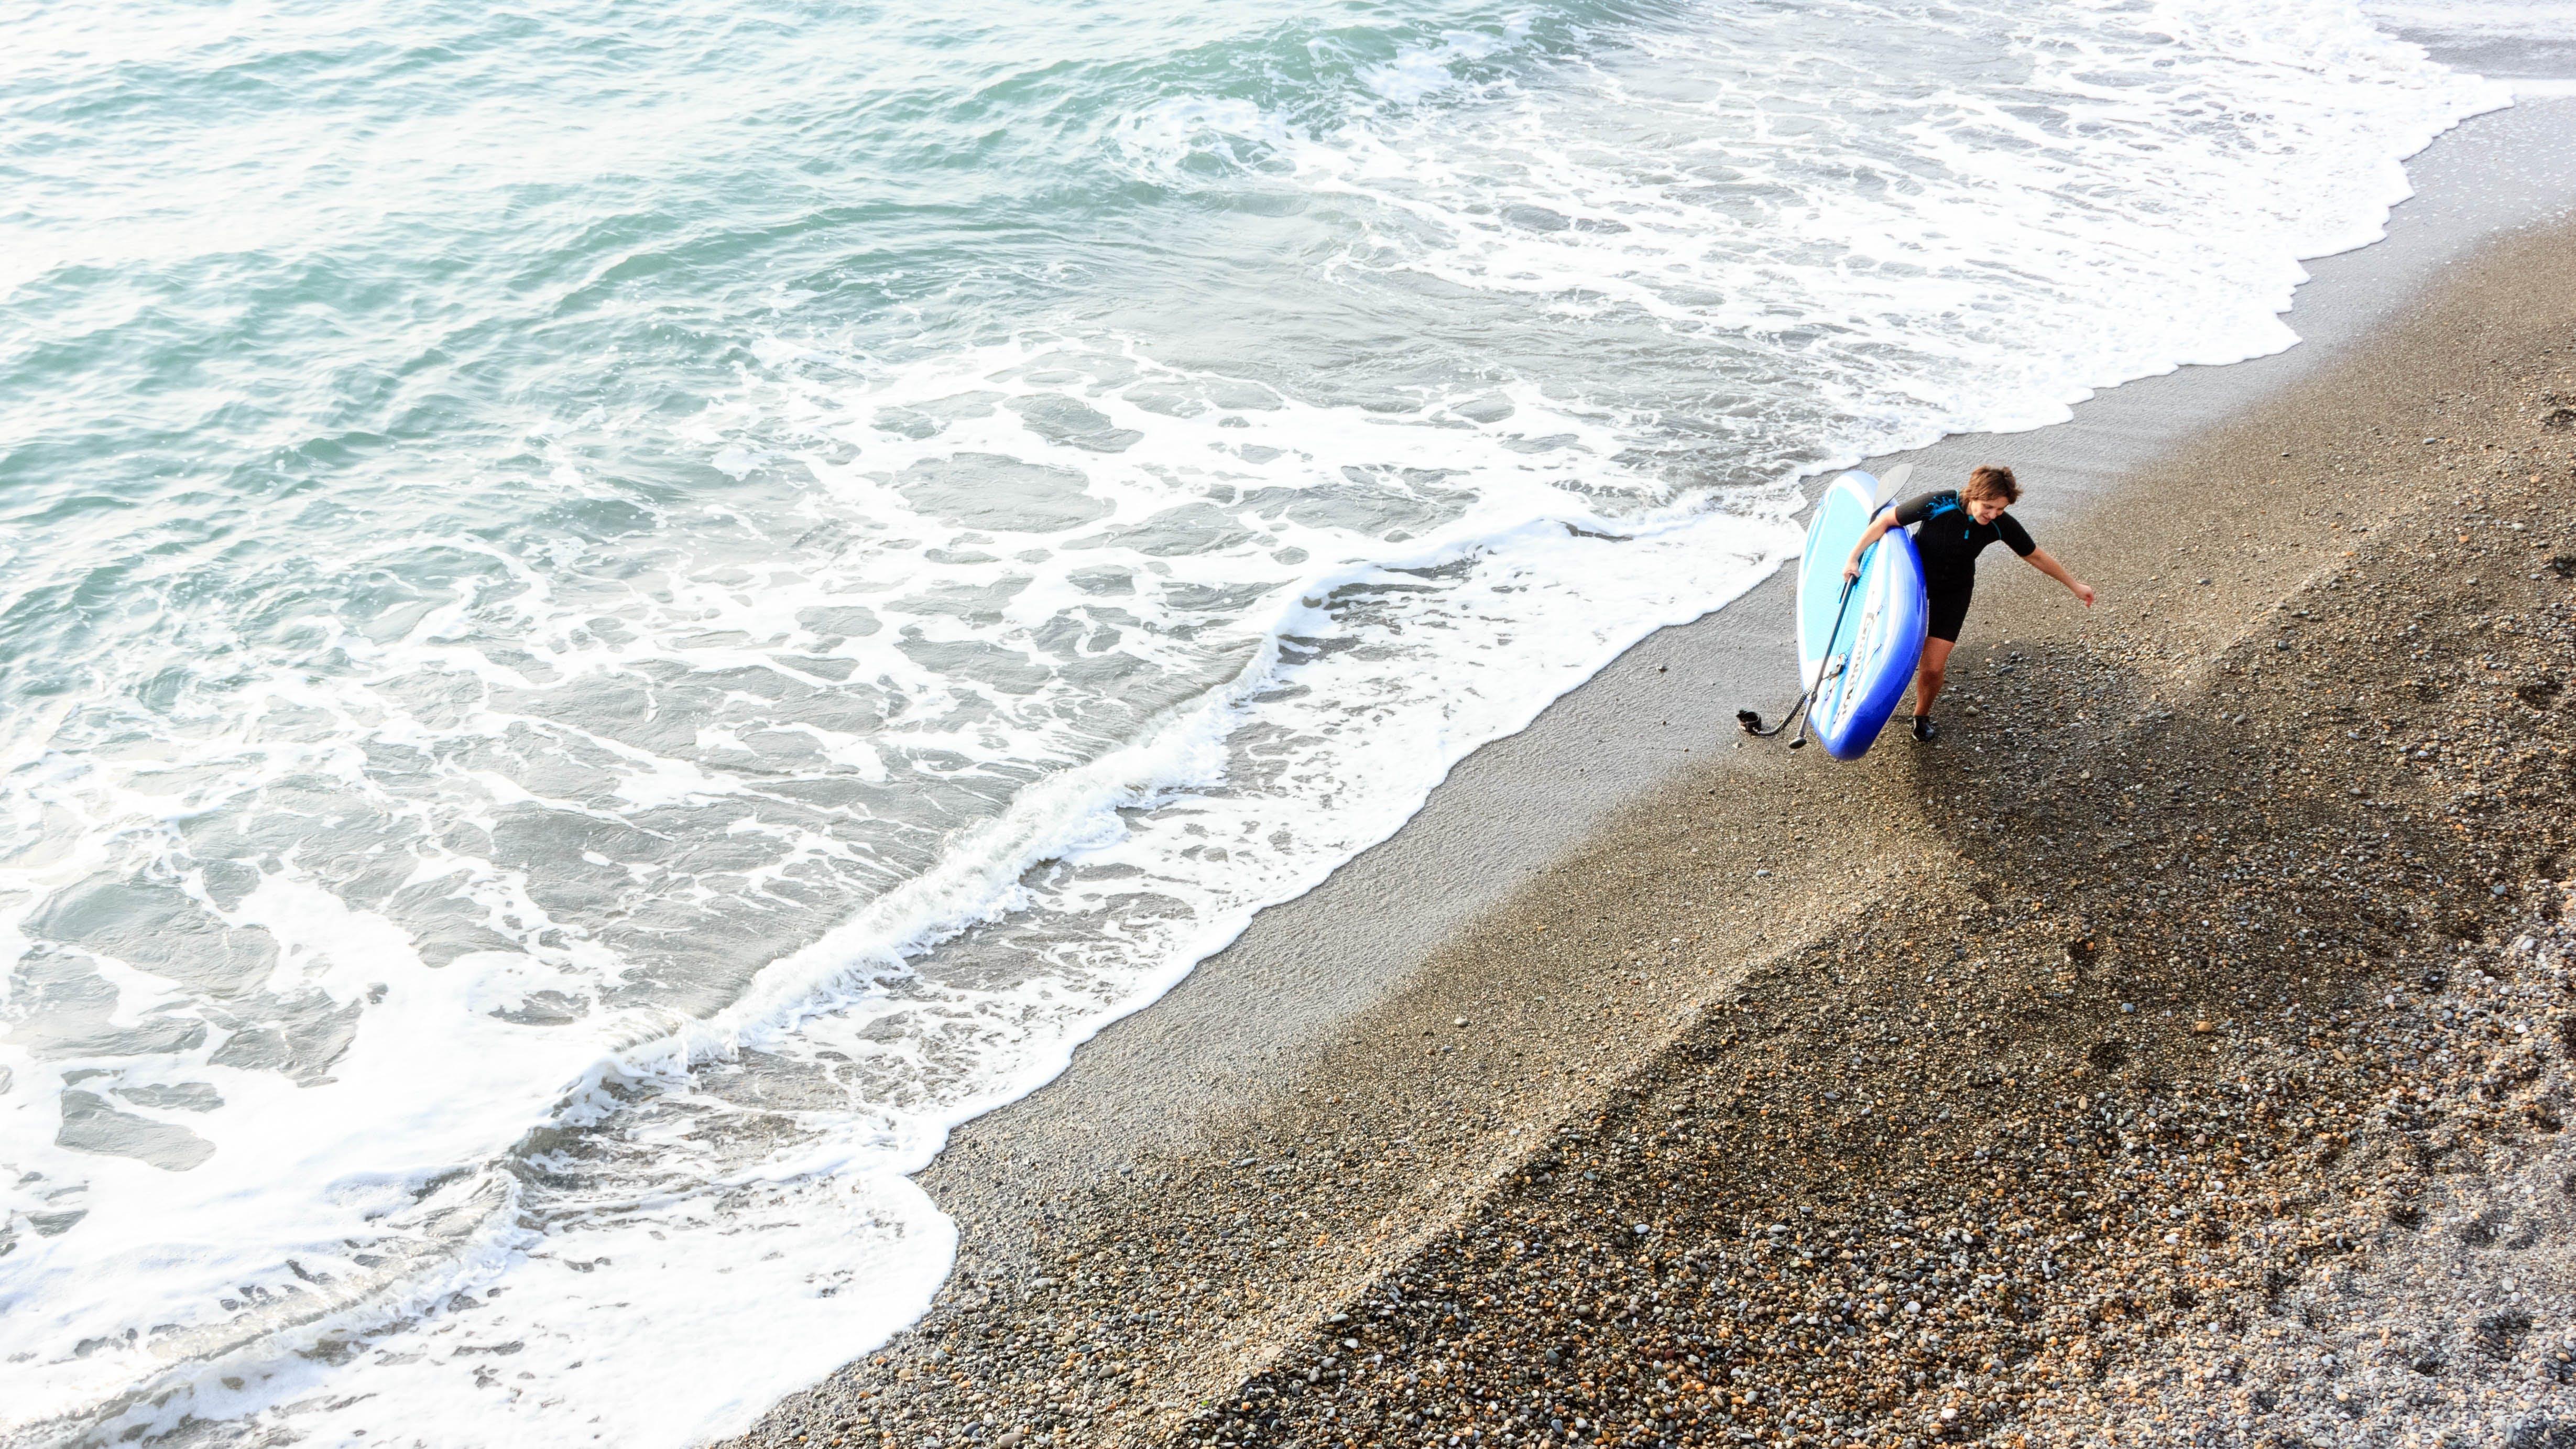 Free stock photo of sea, surfer girl